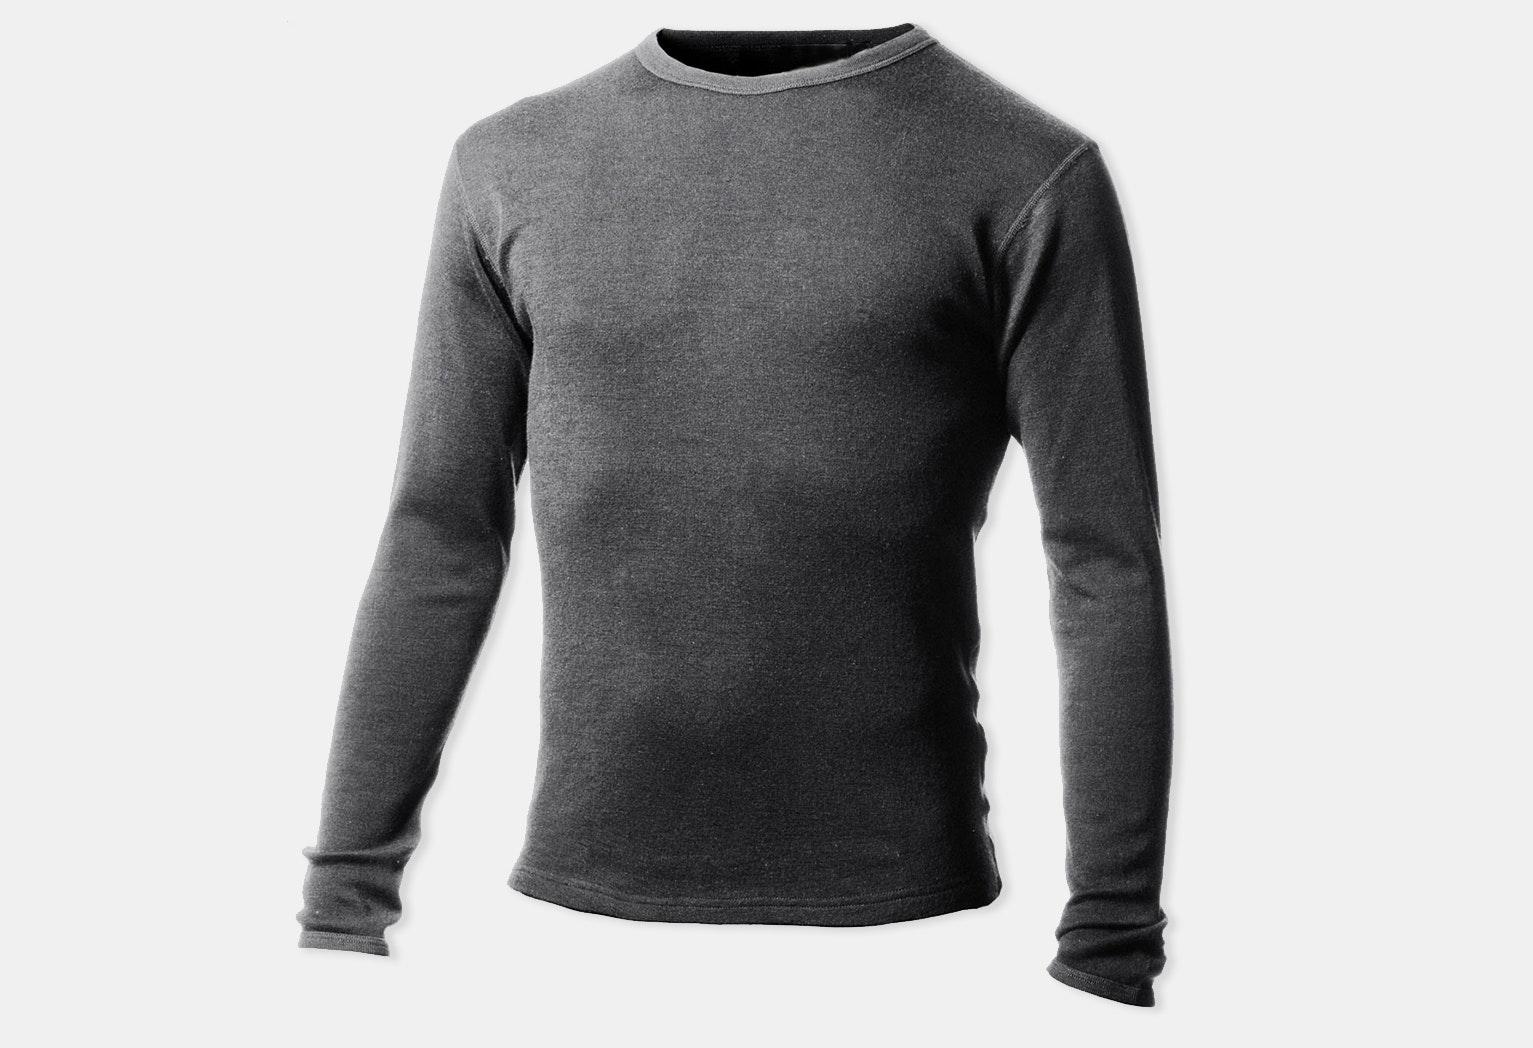 Men's –  Chocorua Top– Charcoal Gray